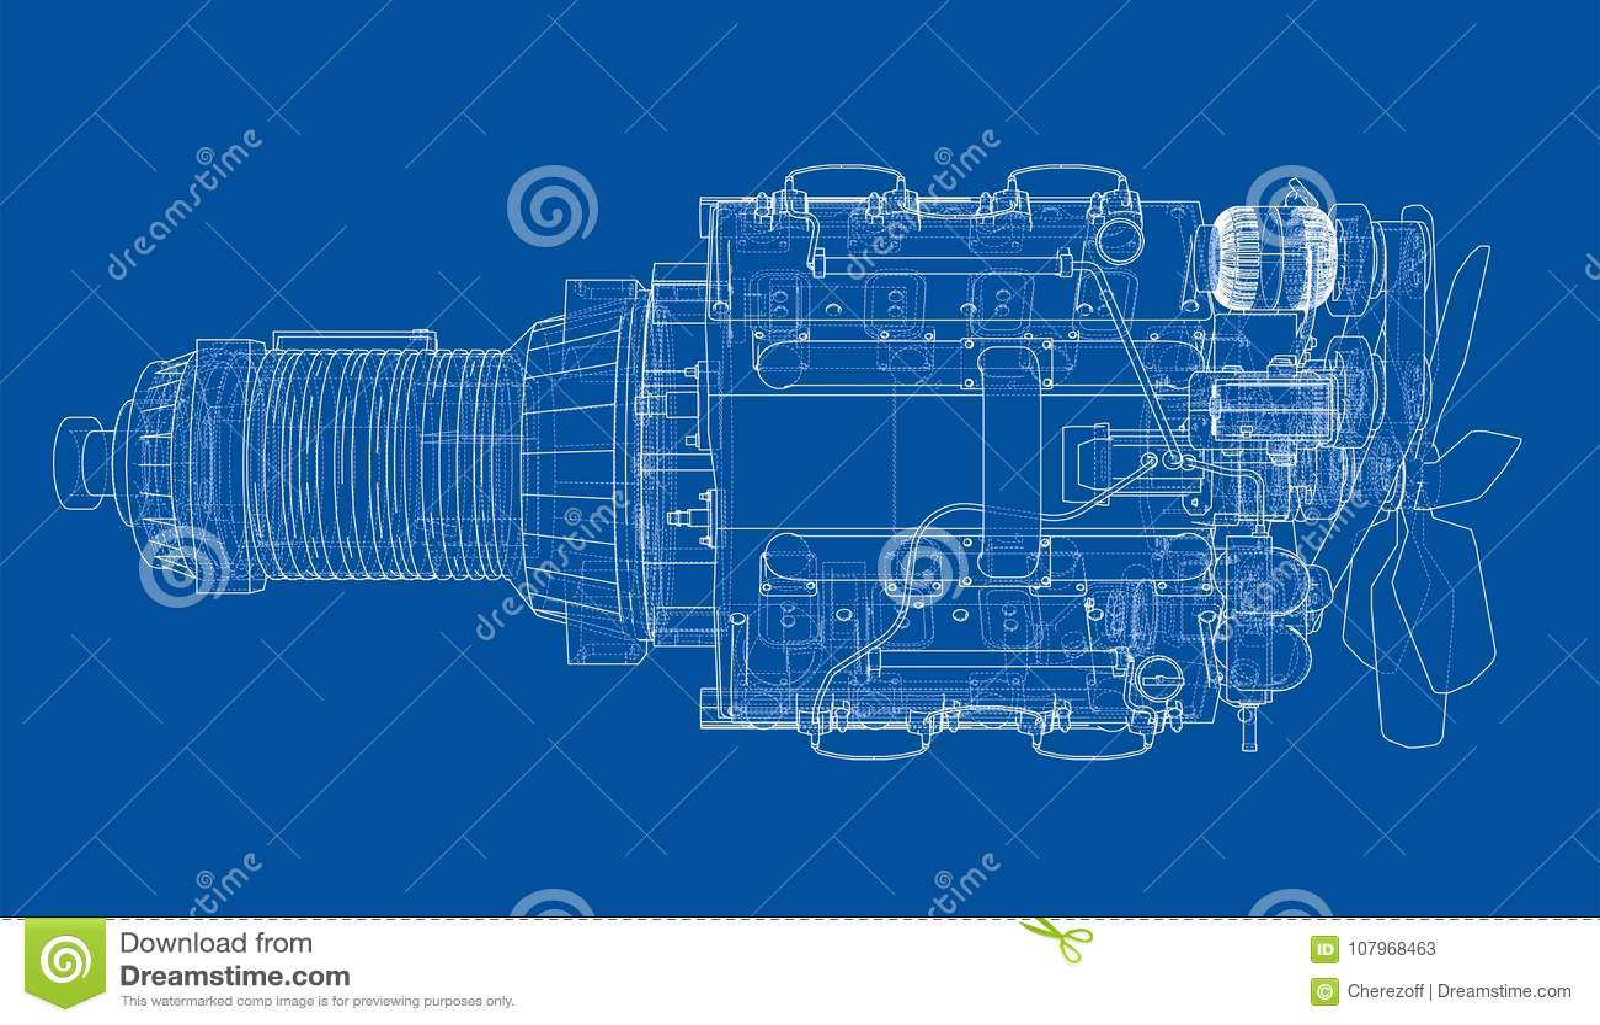 Car engine vector rendering of 3d stock vector illustration of download car engine vector rendering of 3d stock vector illustration of blueprint background malvernweather Gallery